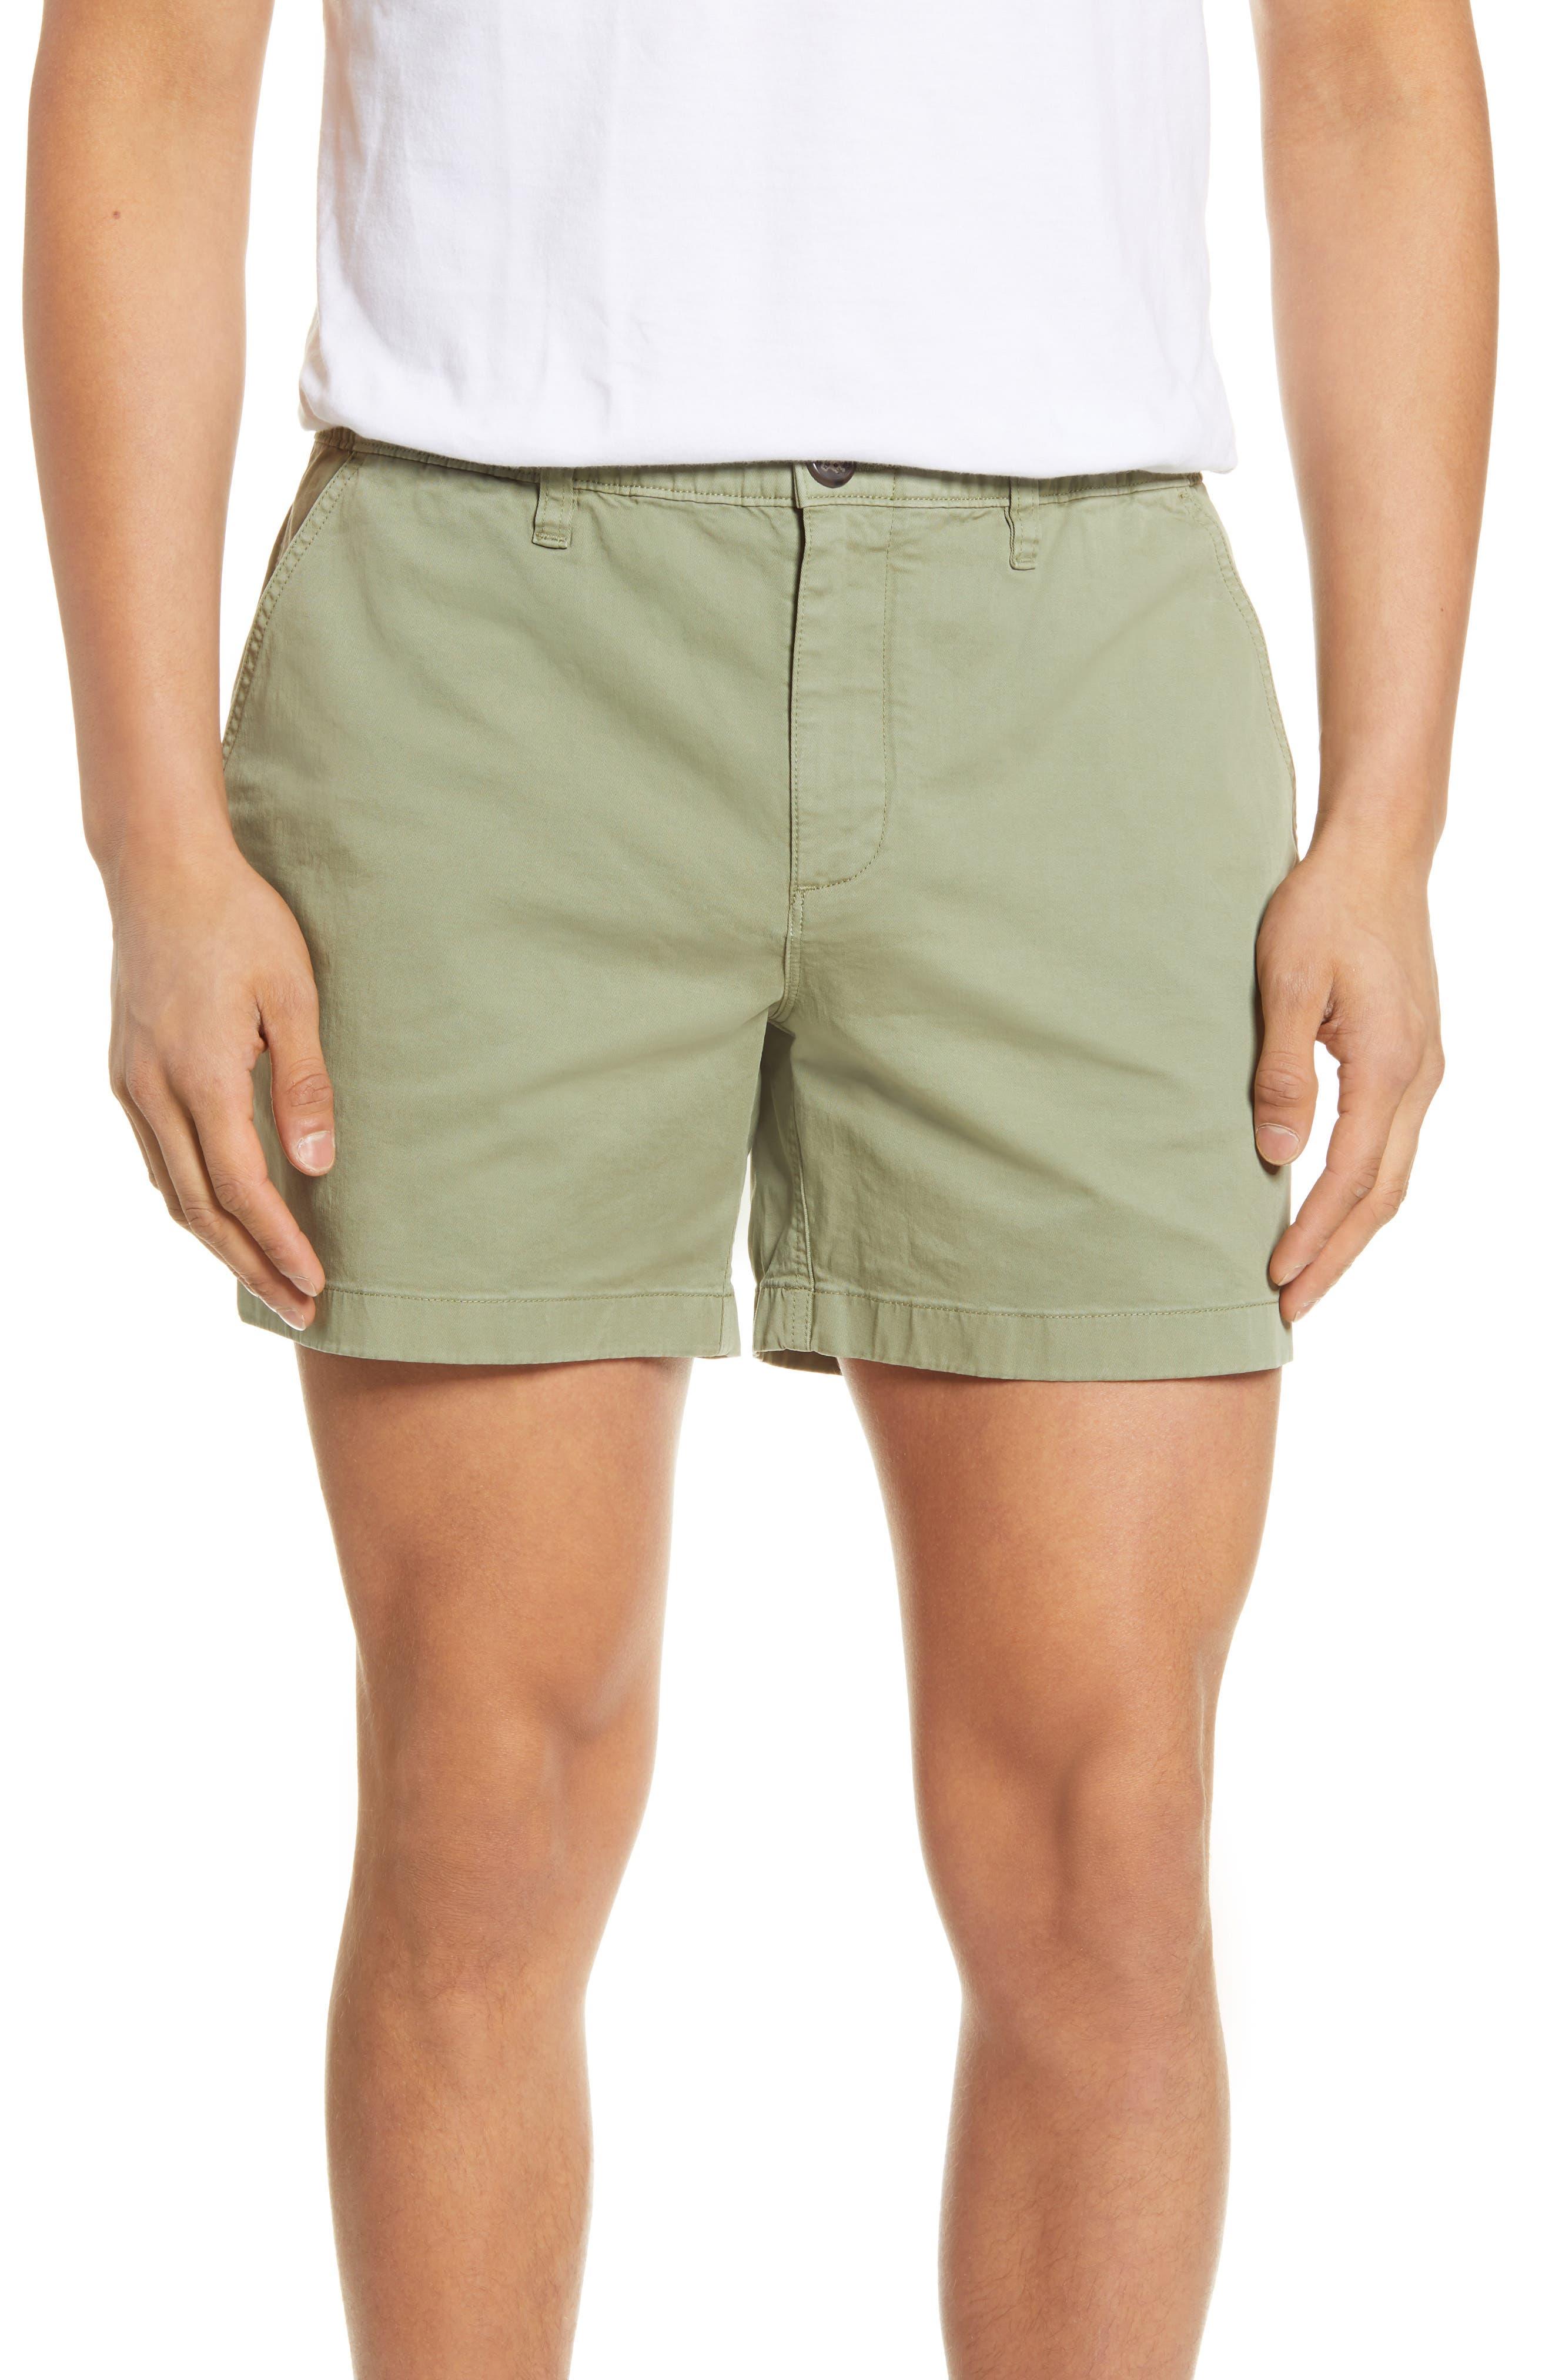 The Hunters Shorts